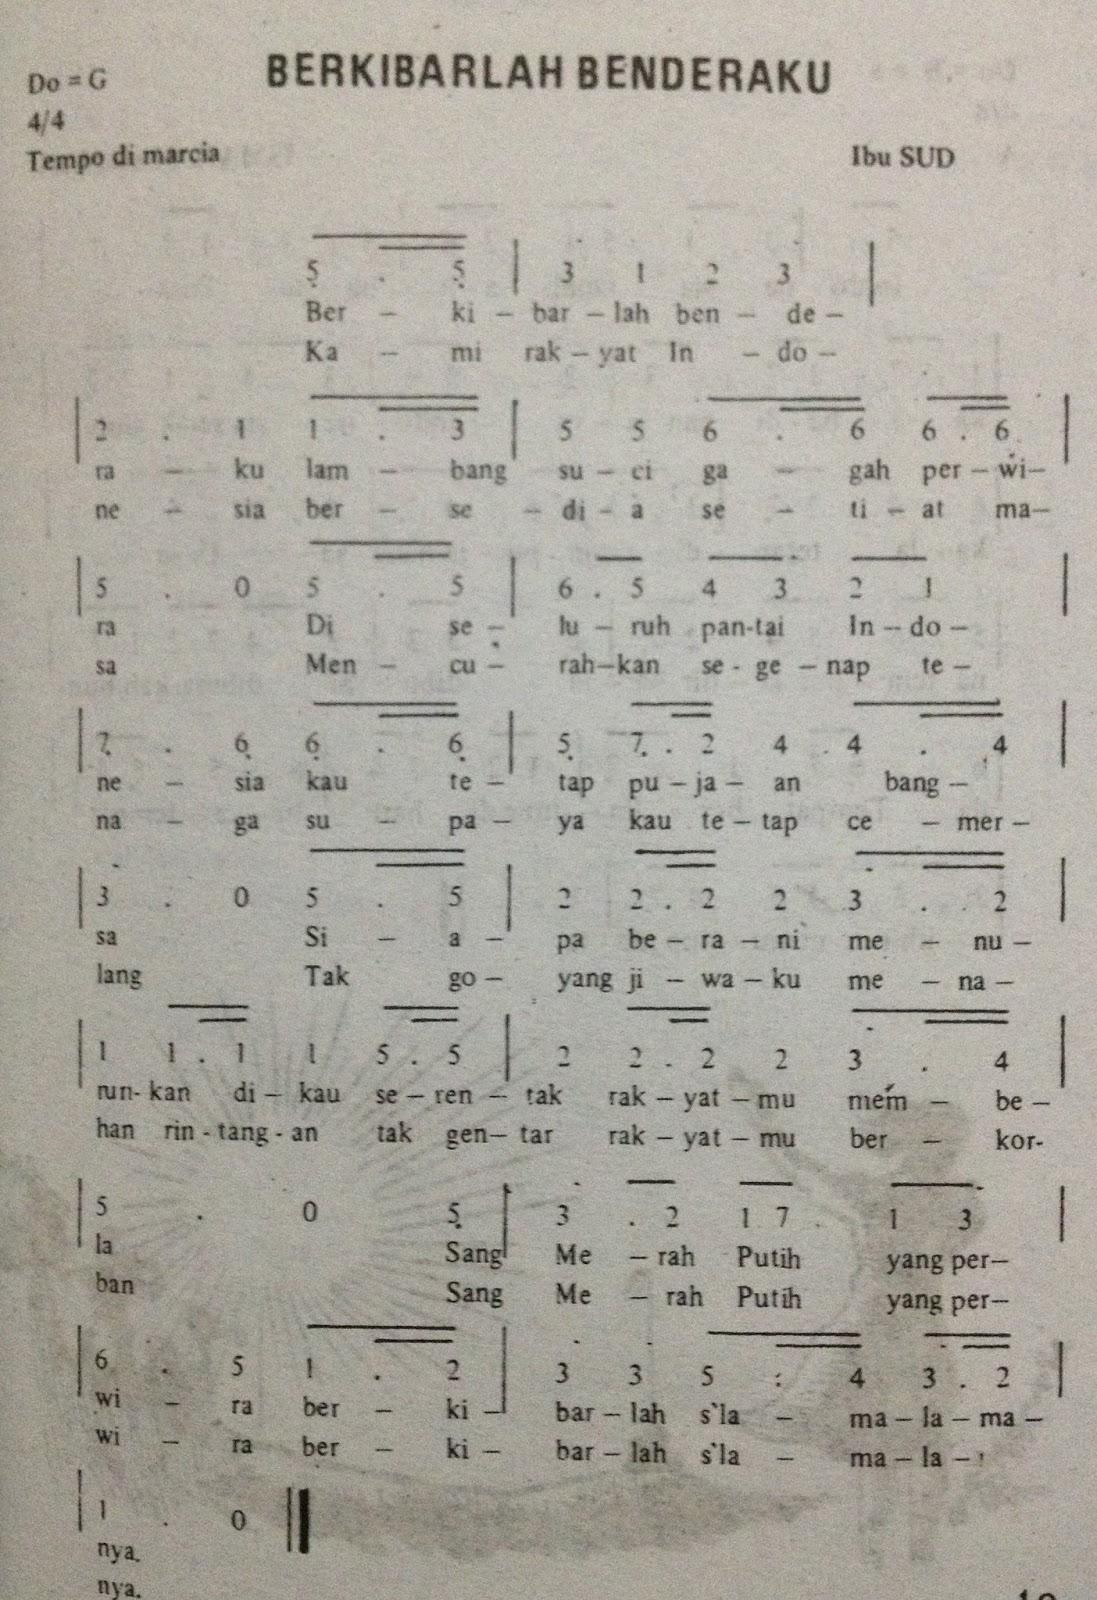 Not Pianika Lagu Berkibarlah Benderaku : pianika, berkibarlah, benderaku, Angka, Pianika, Berkibarlah, Benderaku, Indonesia, Terlengkap